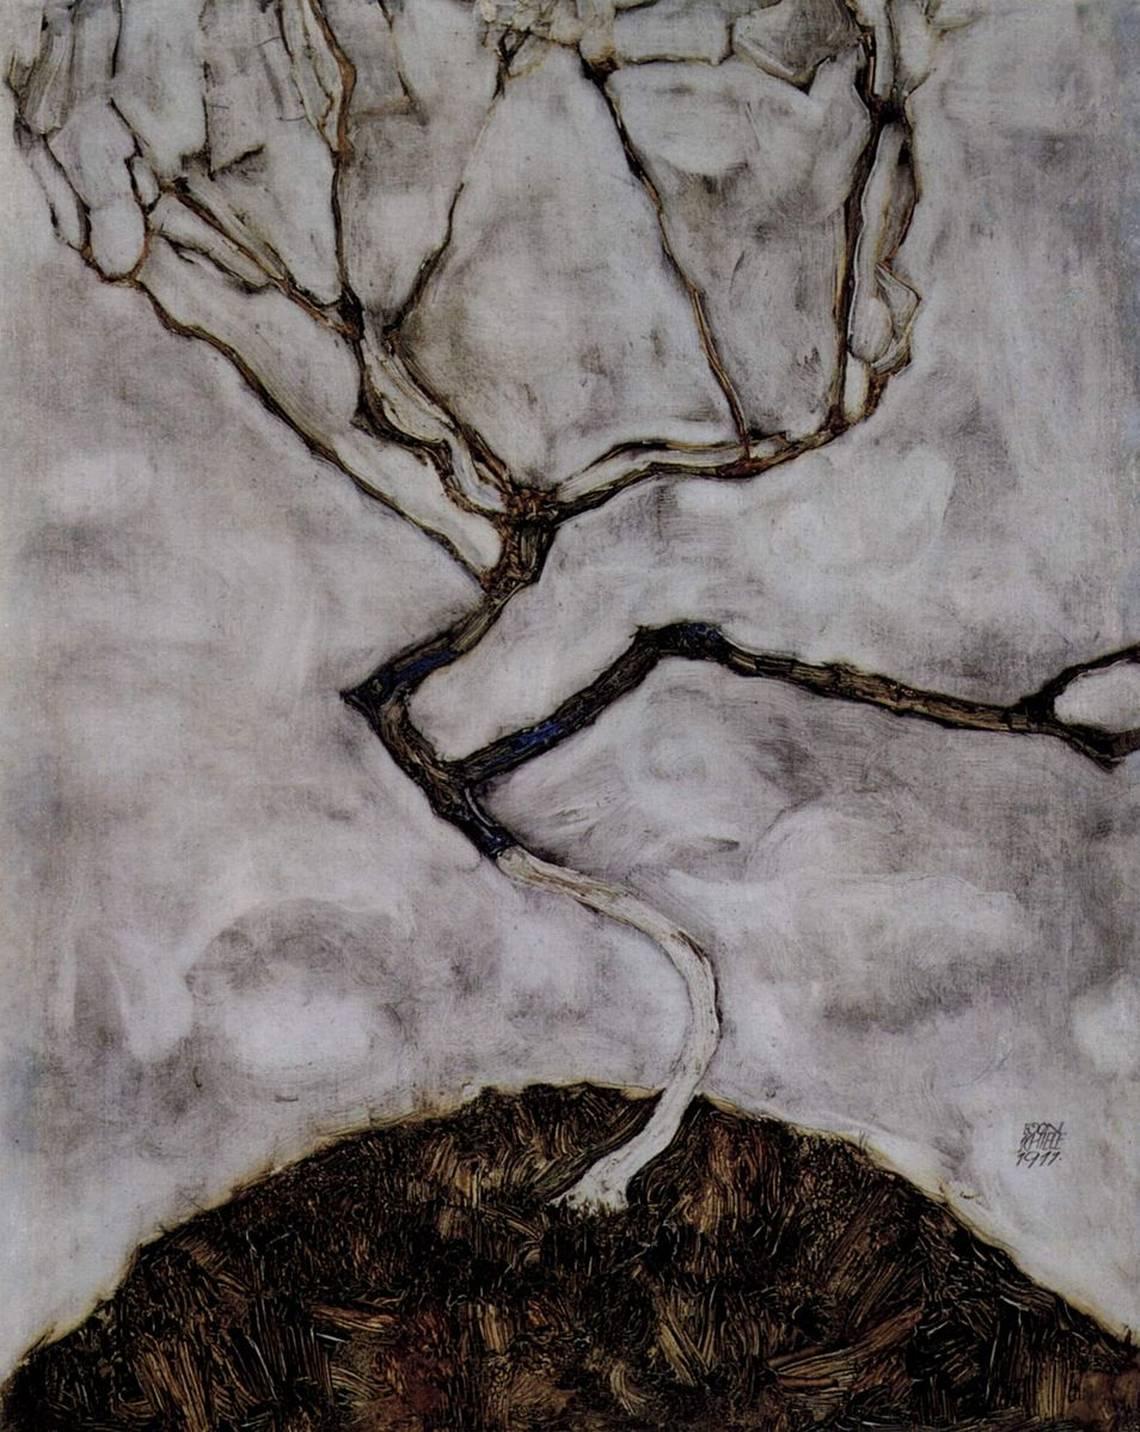 Egon Schiele, Small Tree in Late Autumn, 1911